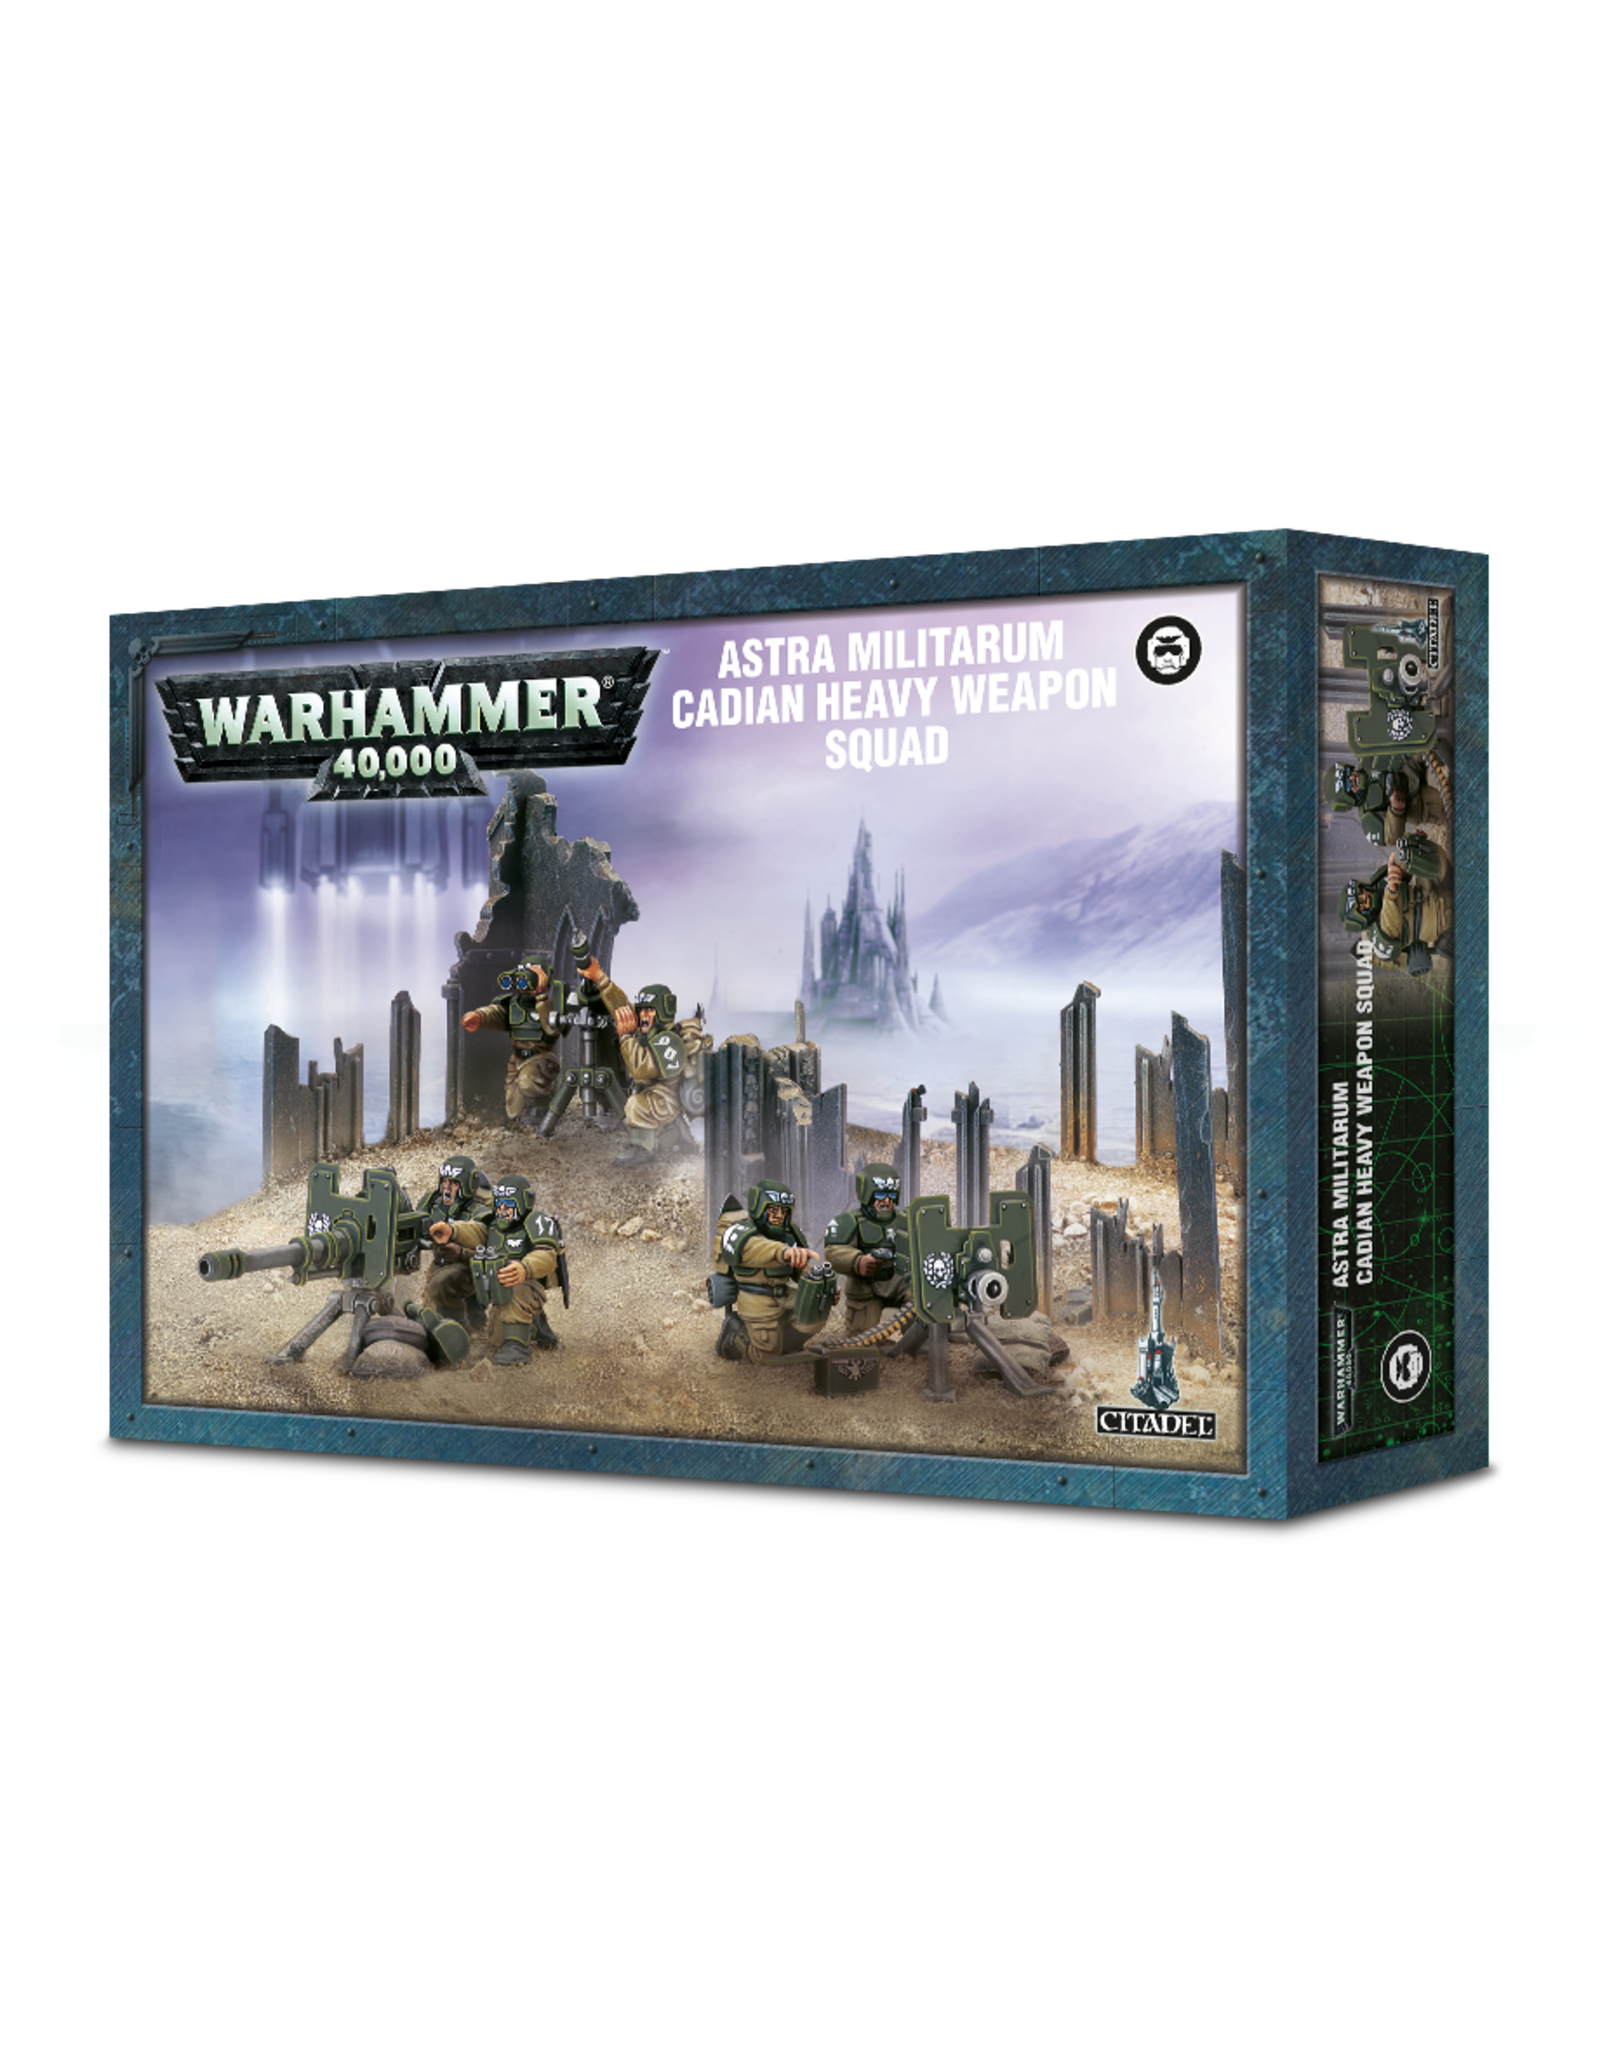 Games-Workshop Astra Militarium Cadian Heavy Weapons Squad